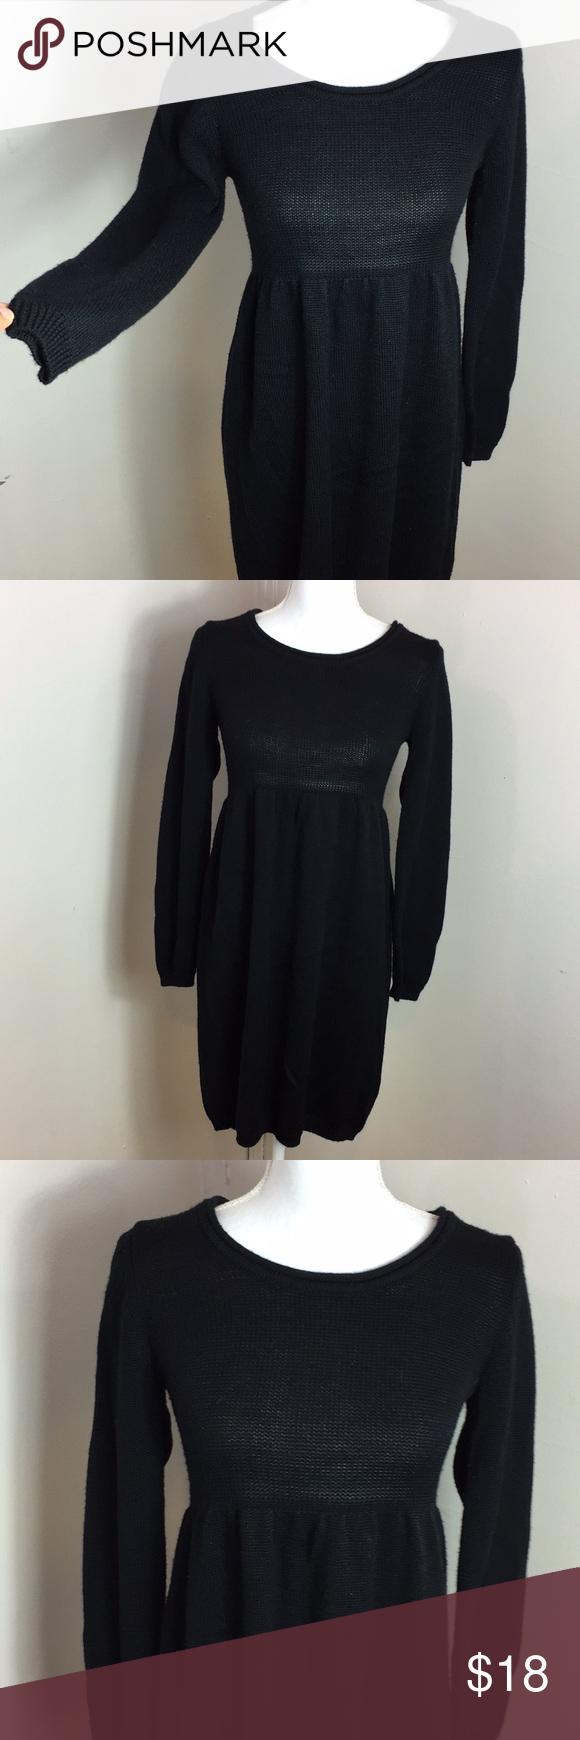 Closet Sweater Black Posh Dress Calvin Wool Pinterest Klein My 6qUwwO0x